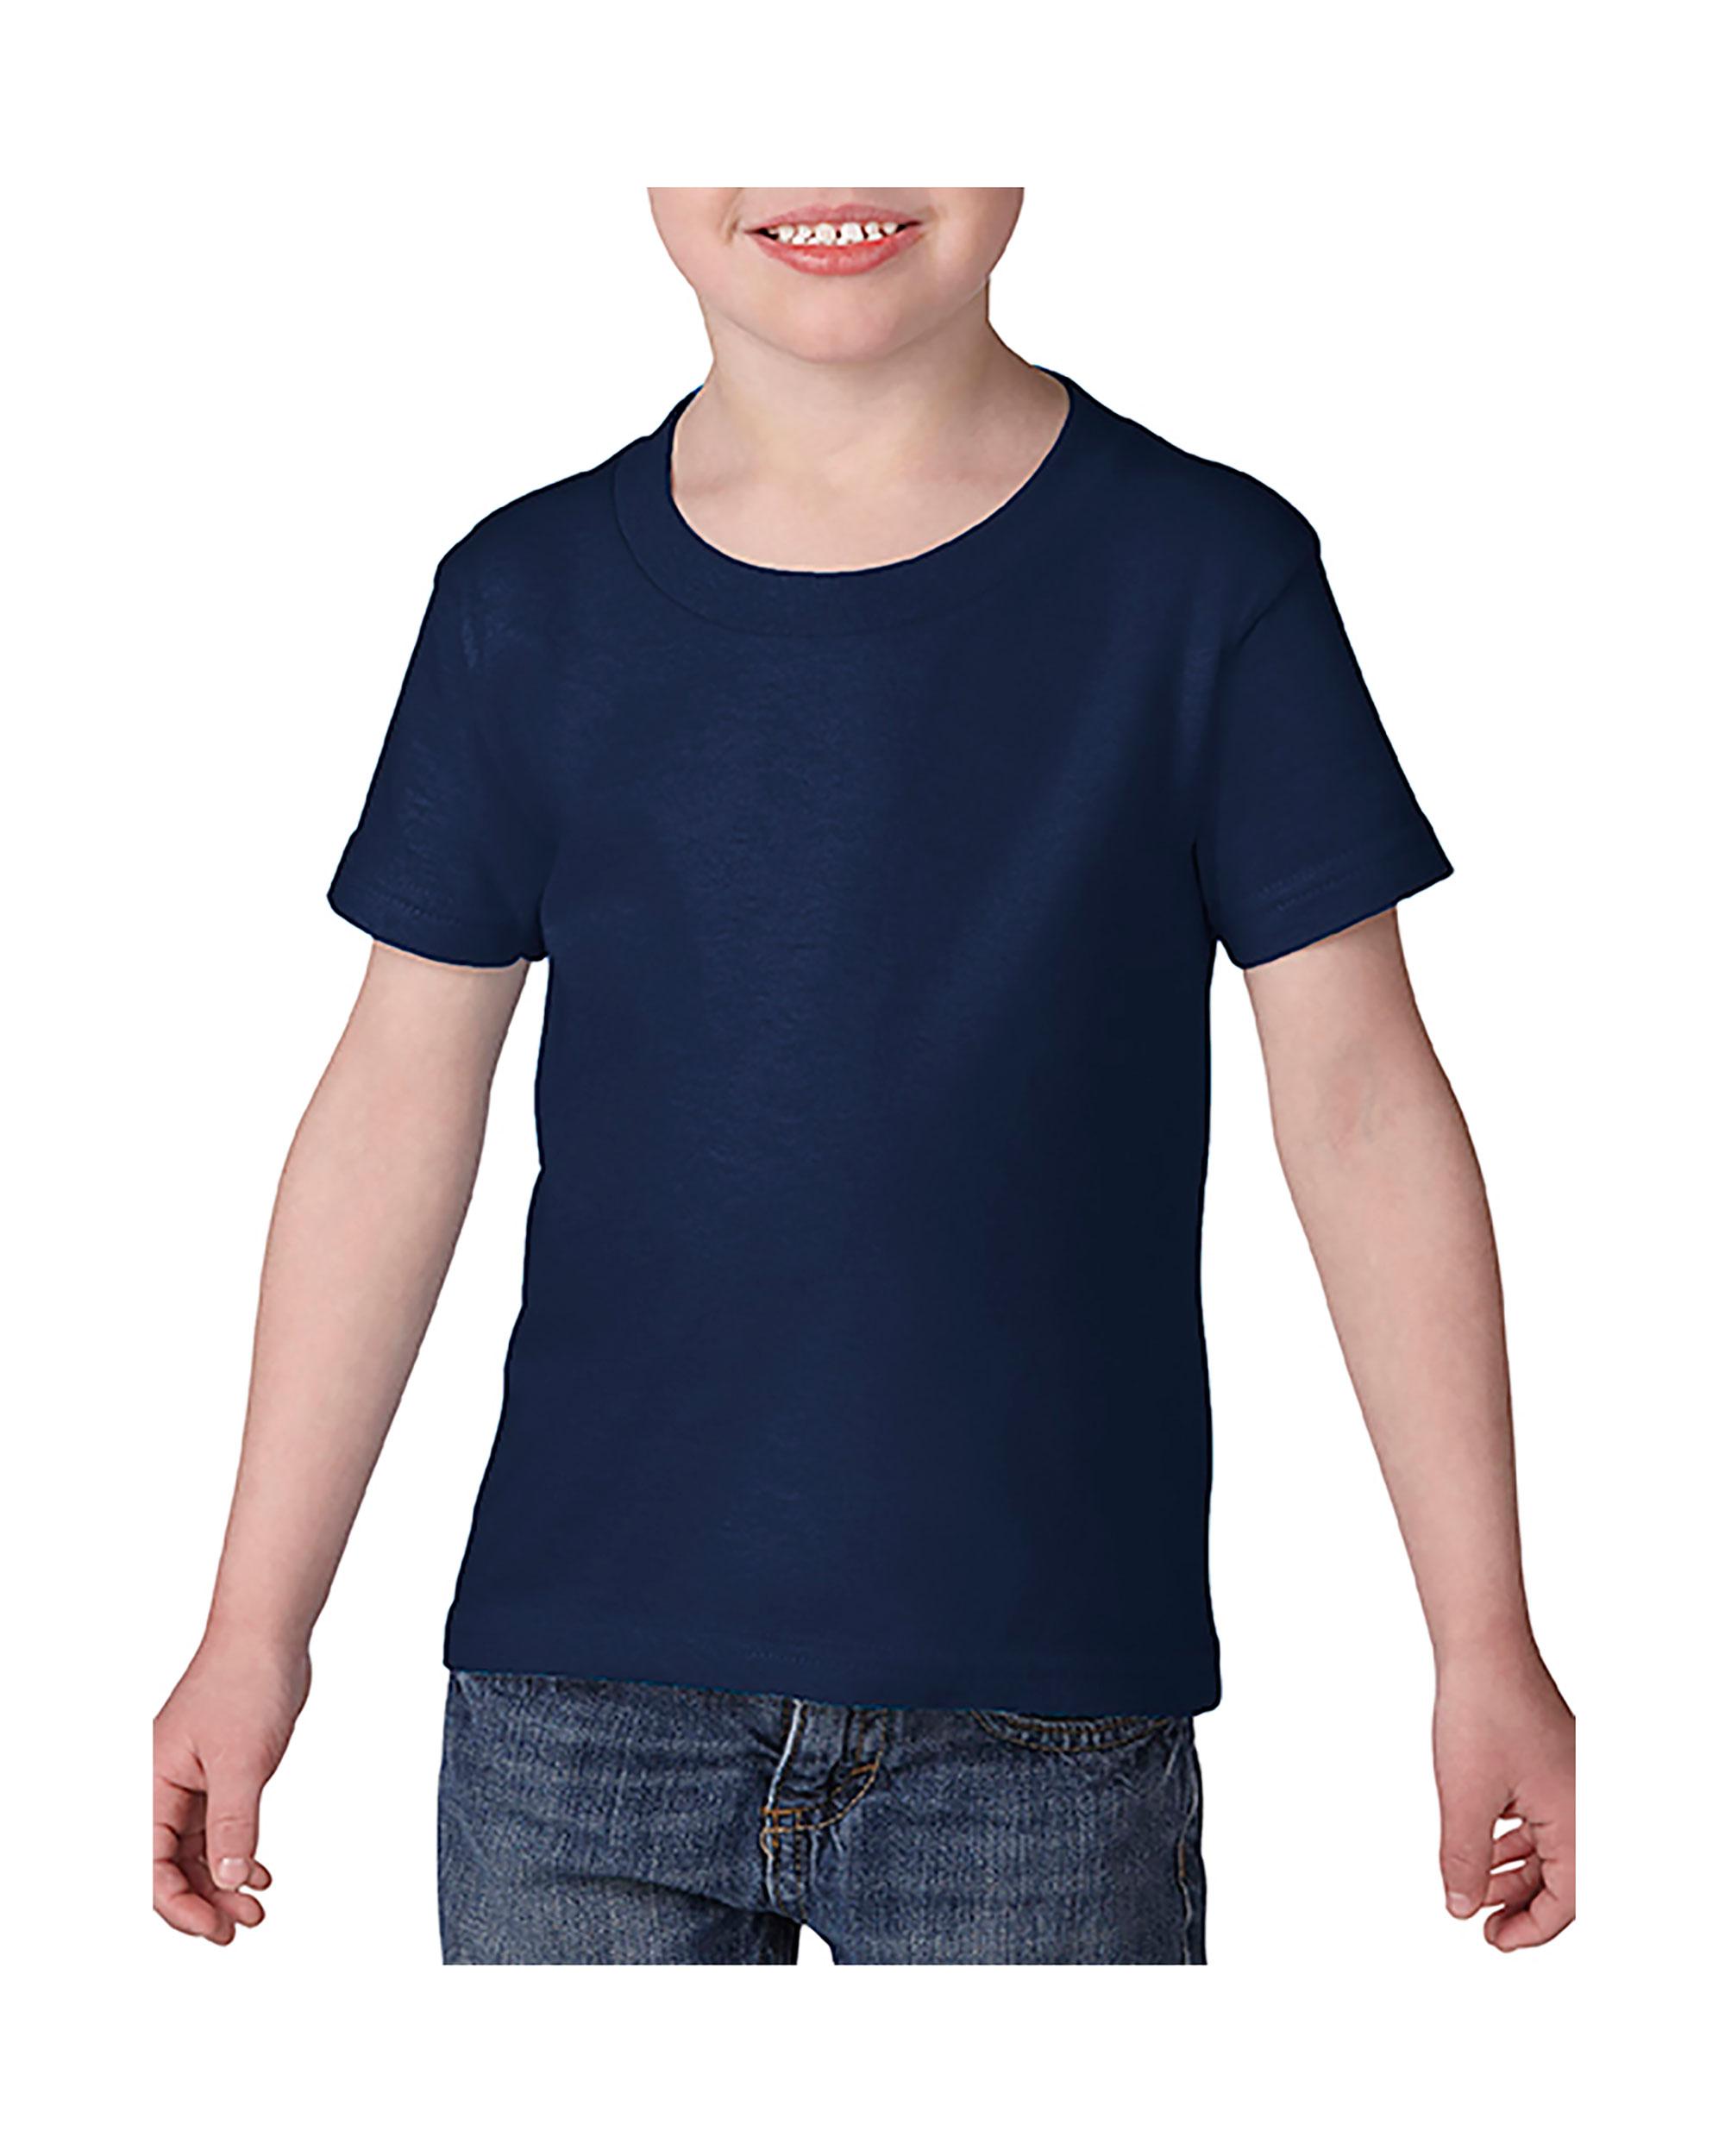 Gildan Toddler Softstyle® 4.5 Oz. T-Shirt, Style G64500P